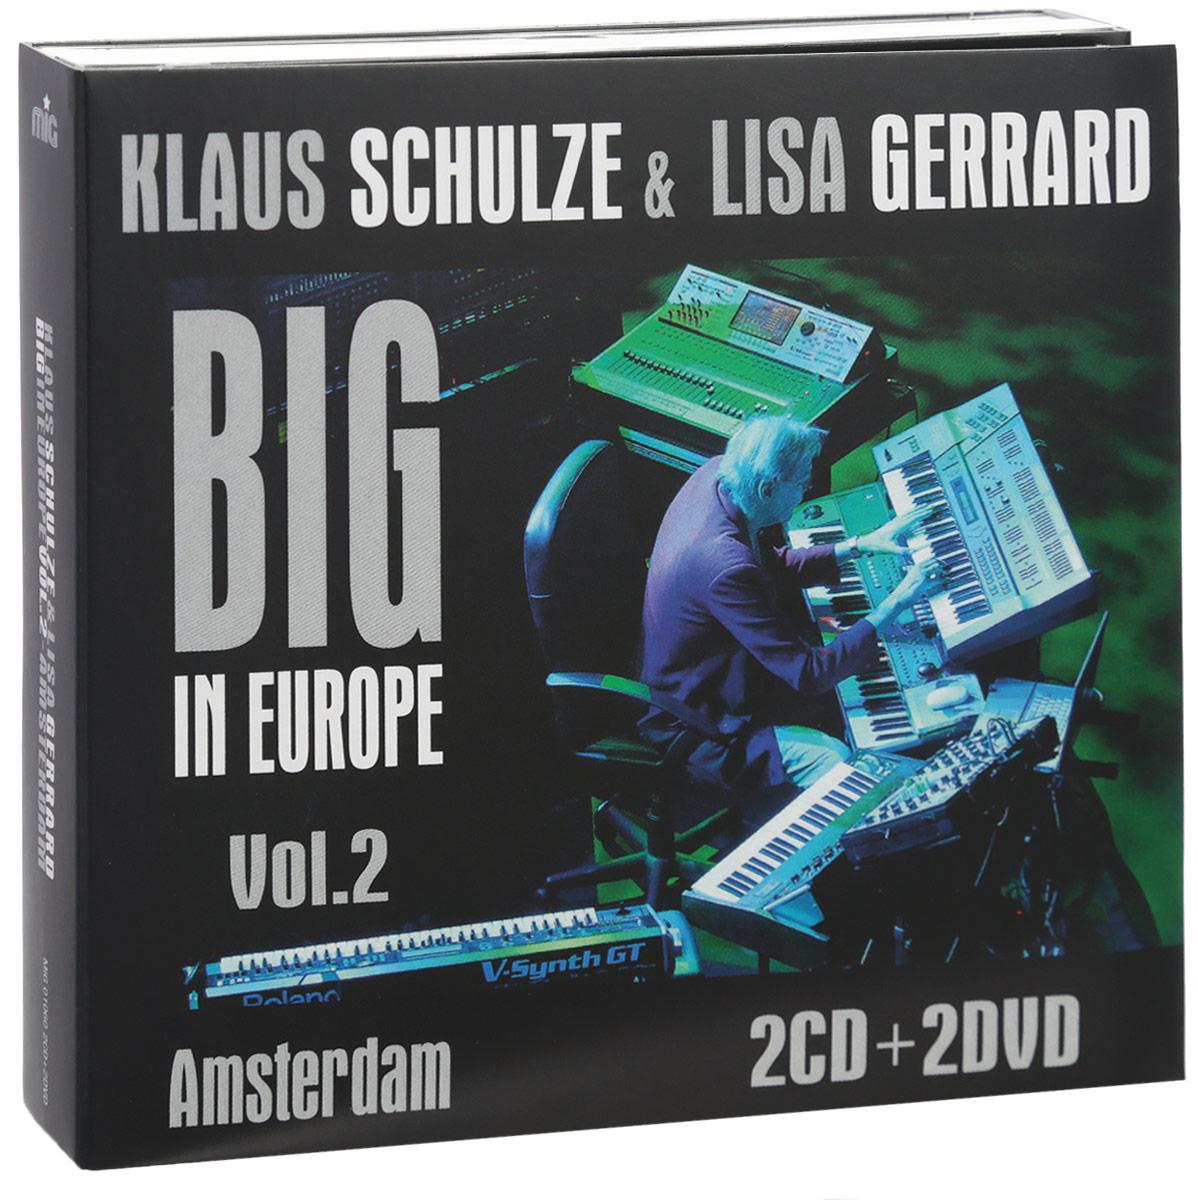 цена на Клаус Шульце,Лайза Джеррард Klaus Schulze & Lisa Gerrard. Big In Europe Vol. 2. Amsterdam (2 CD + 2 DVD)